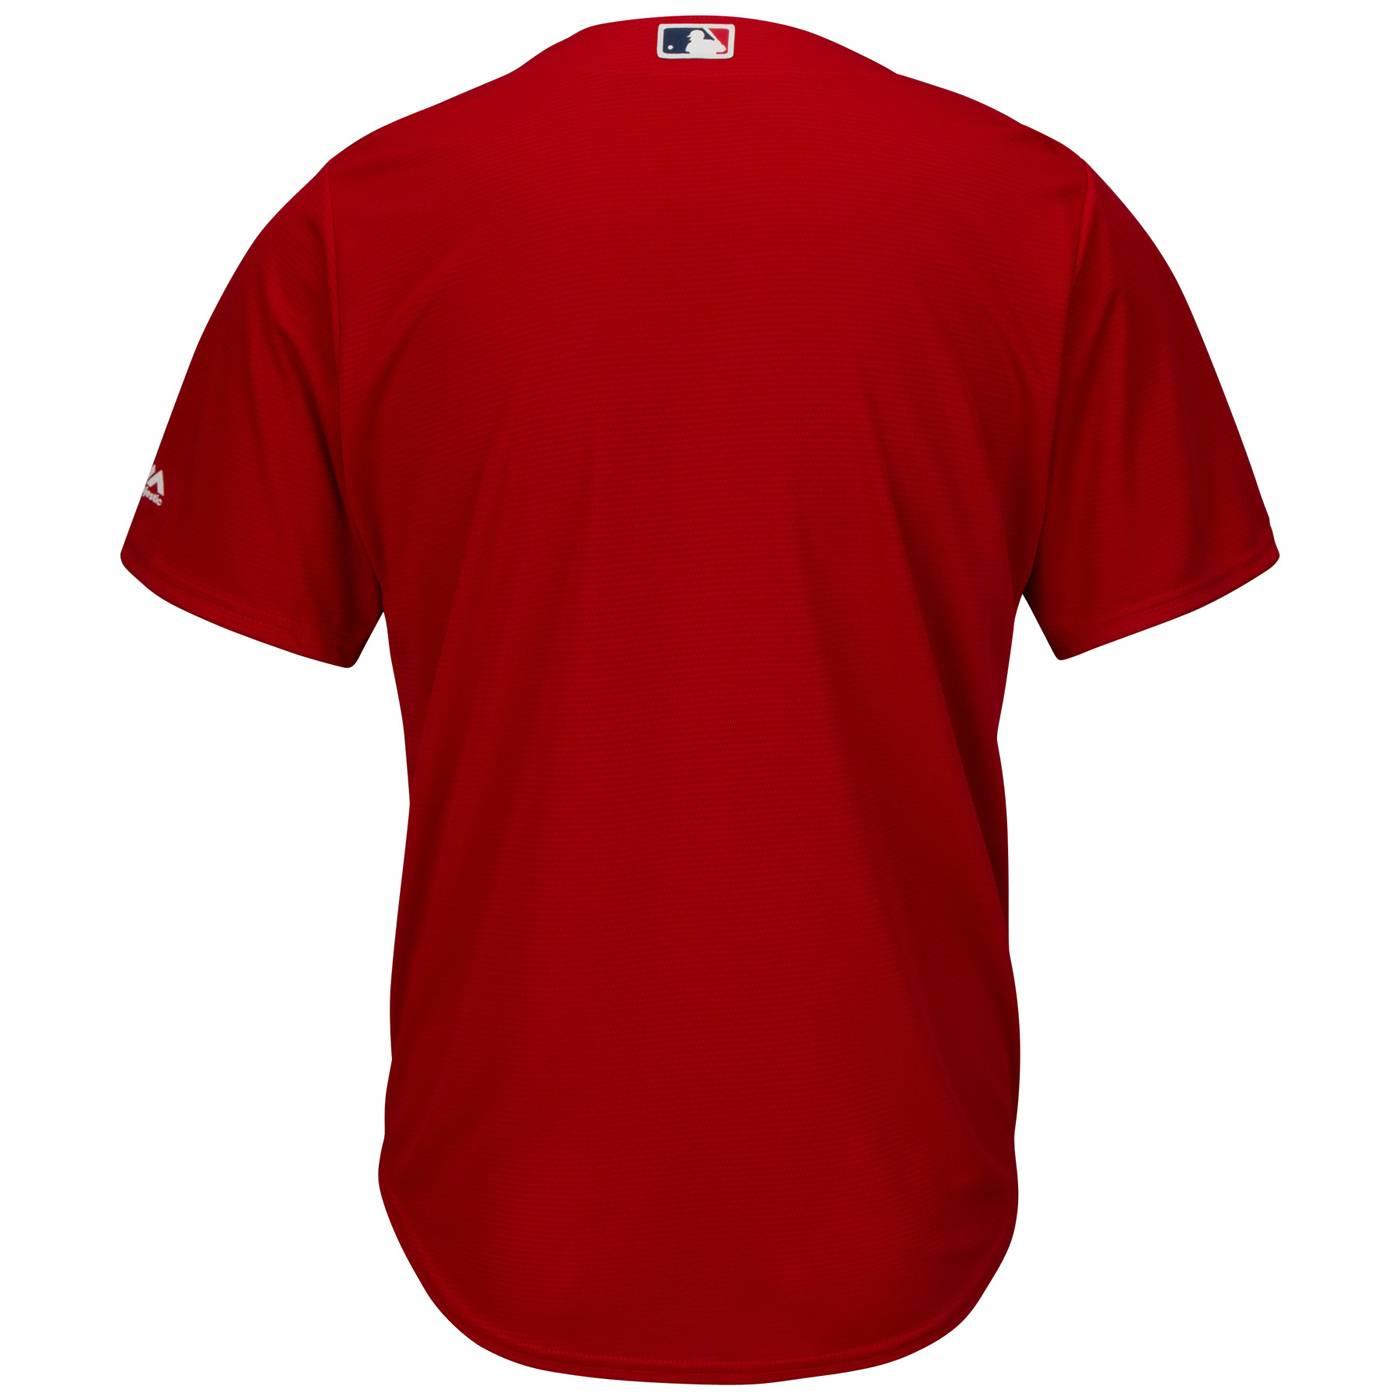 Boston Red Sox Replica Scarlet Alternate Baseball Jersey